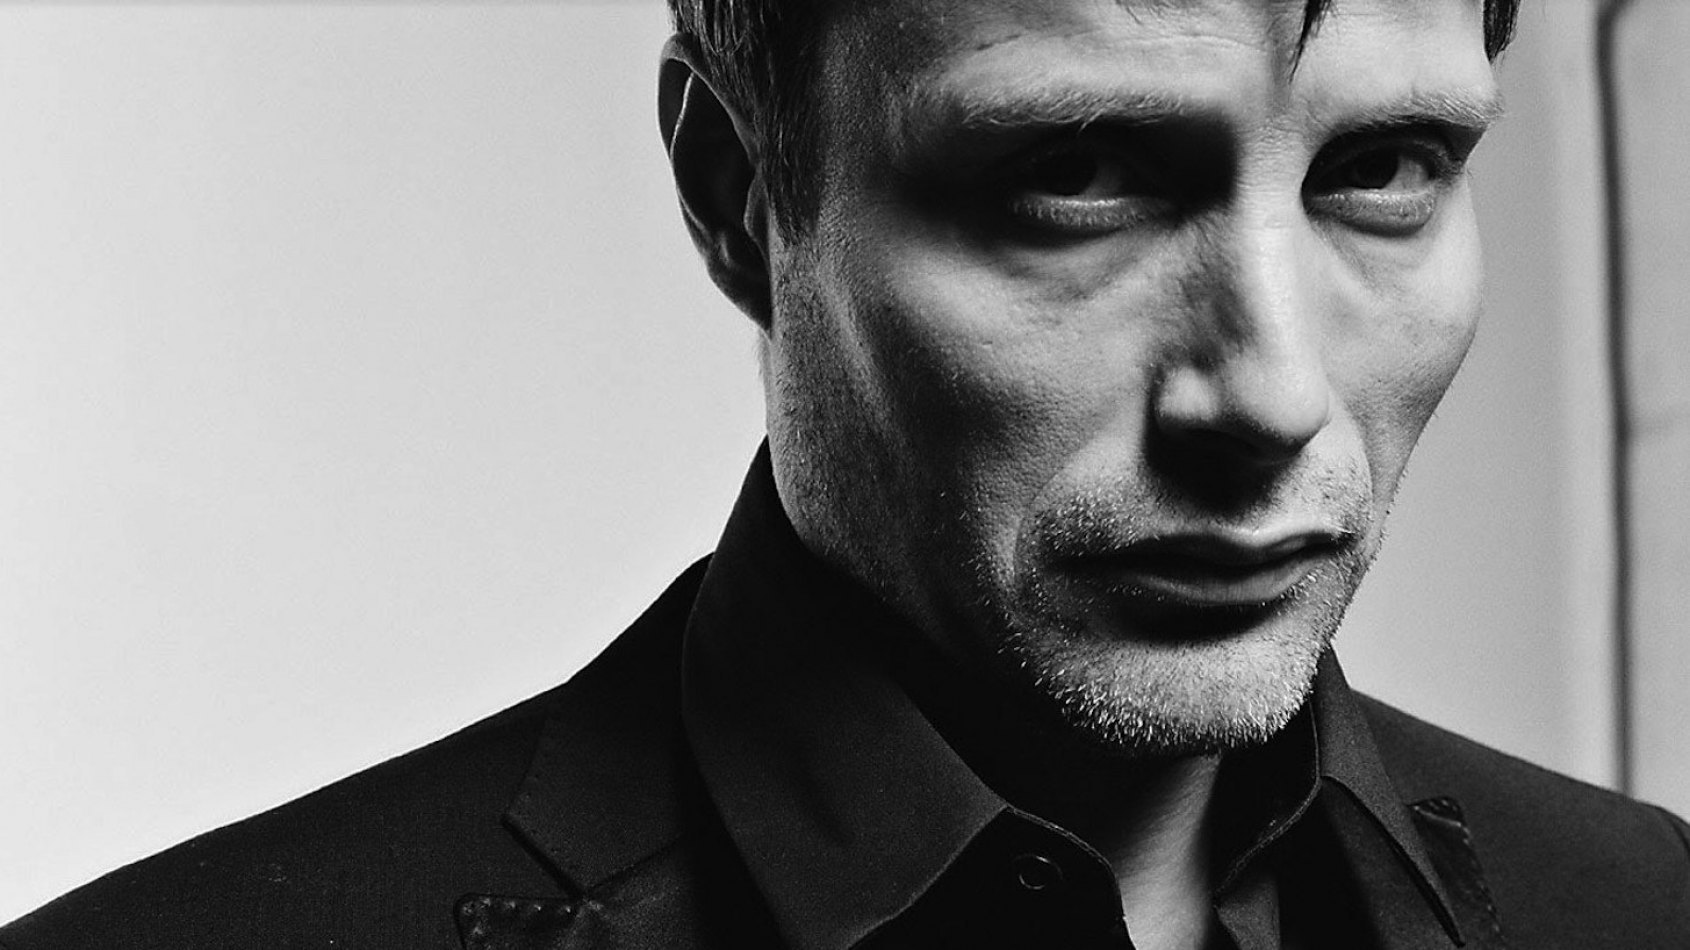 Mads Mikkelsen confirme son rôle dans Rogue One